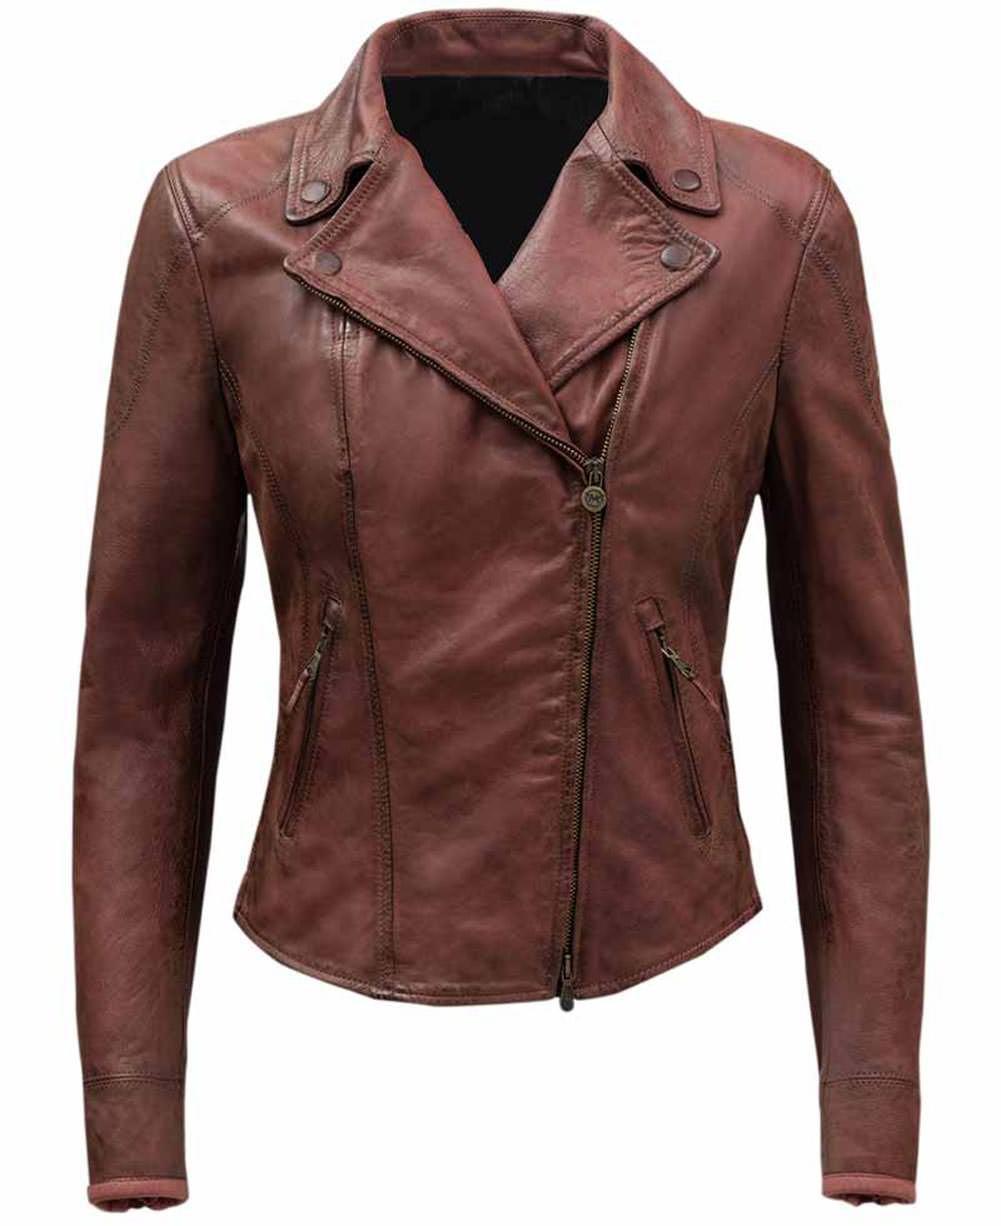 fjackets Women Ramsey Red Slim Fit Elegant Coat Style Leather Jacket - S